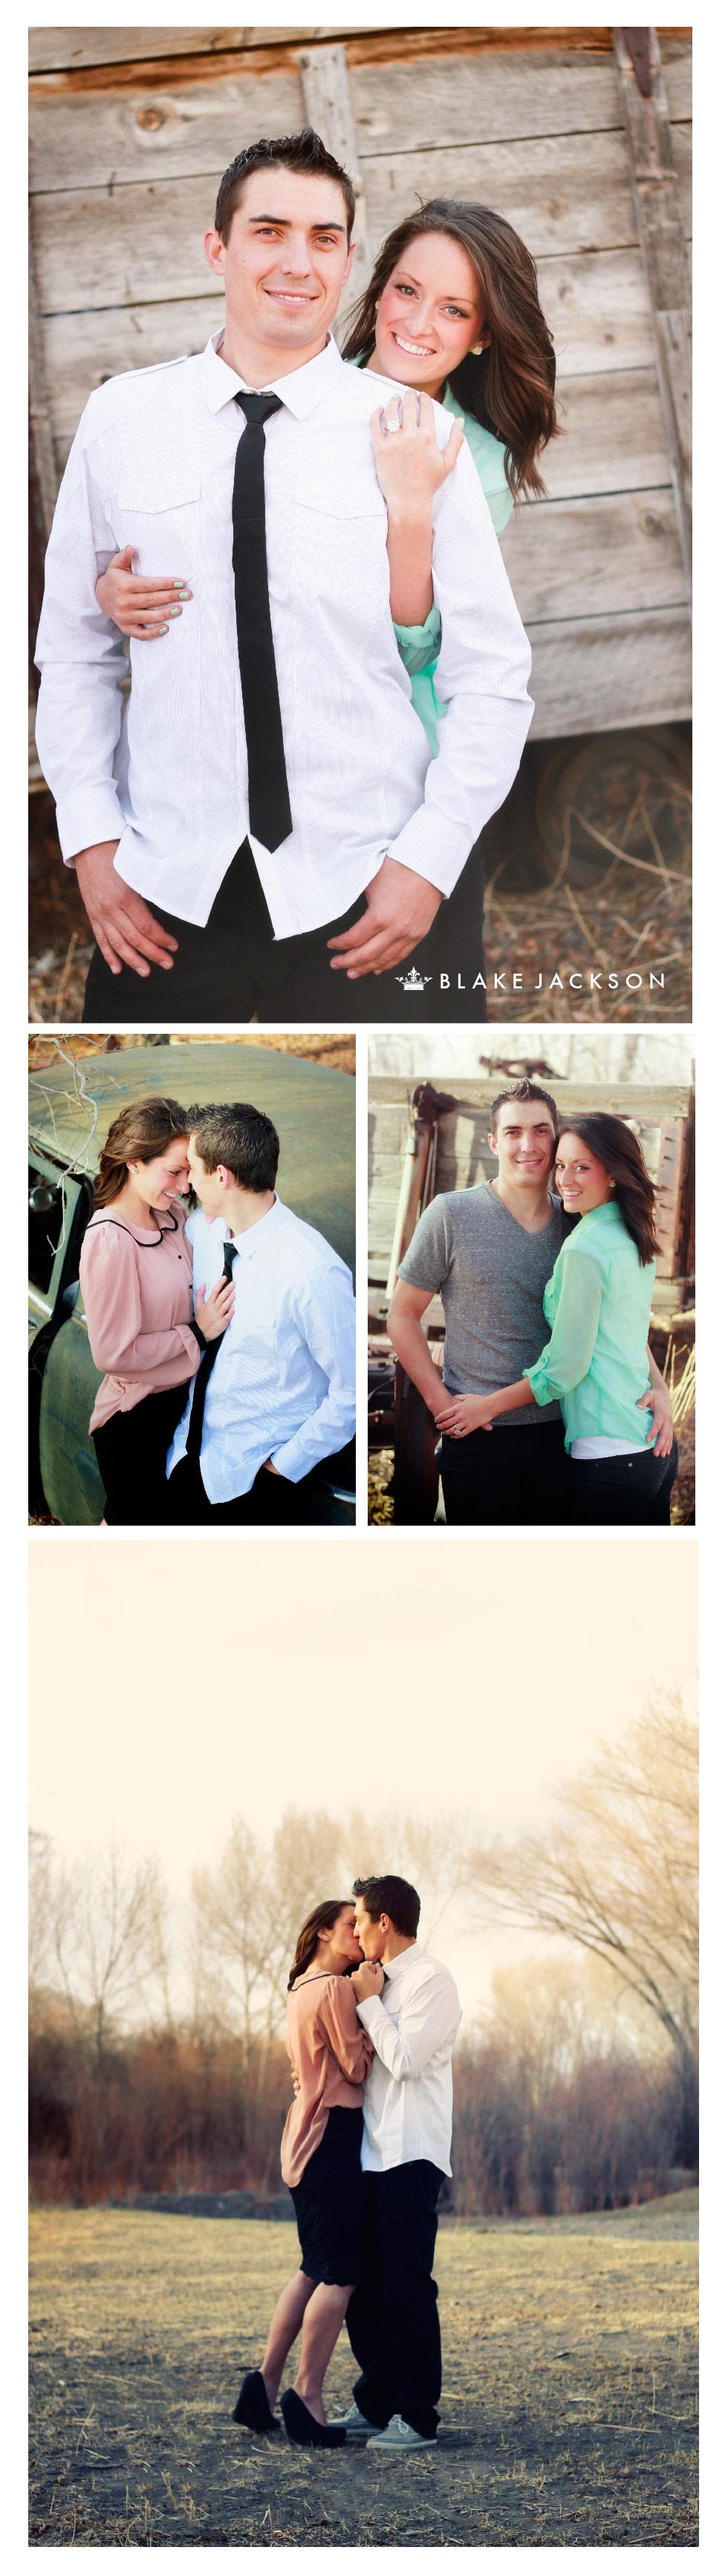 Expressions | Blake Jackson Creative